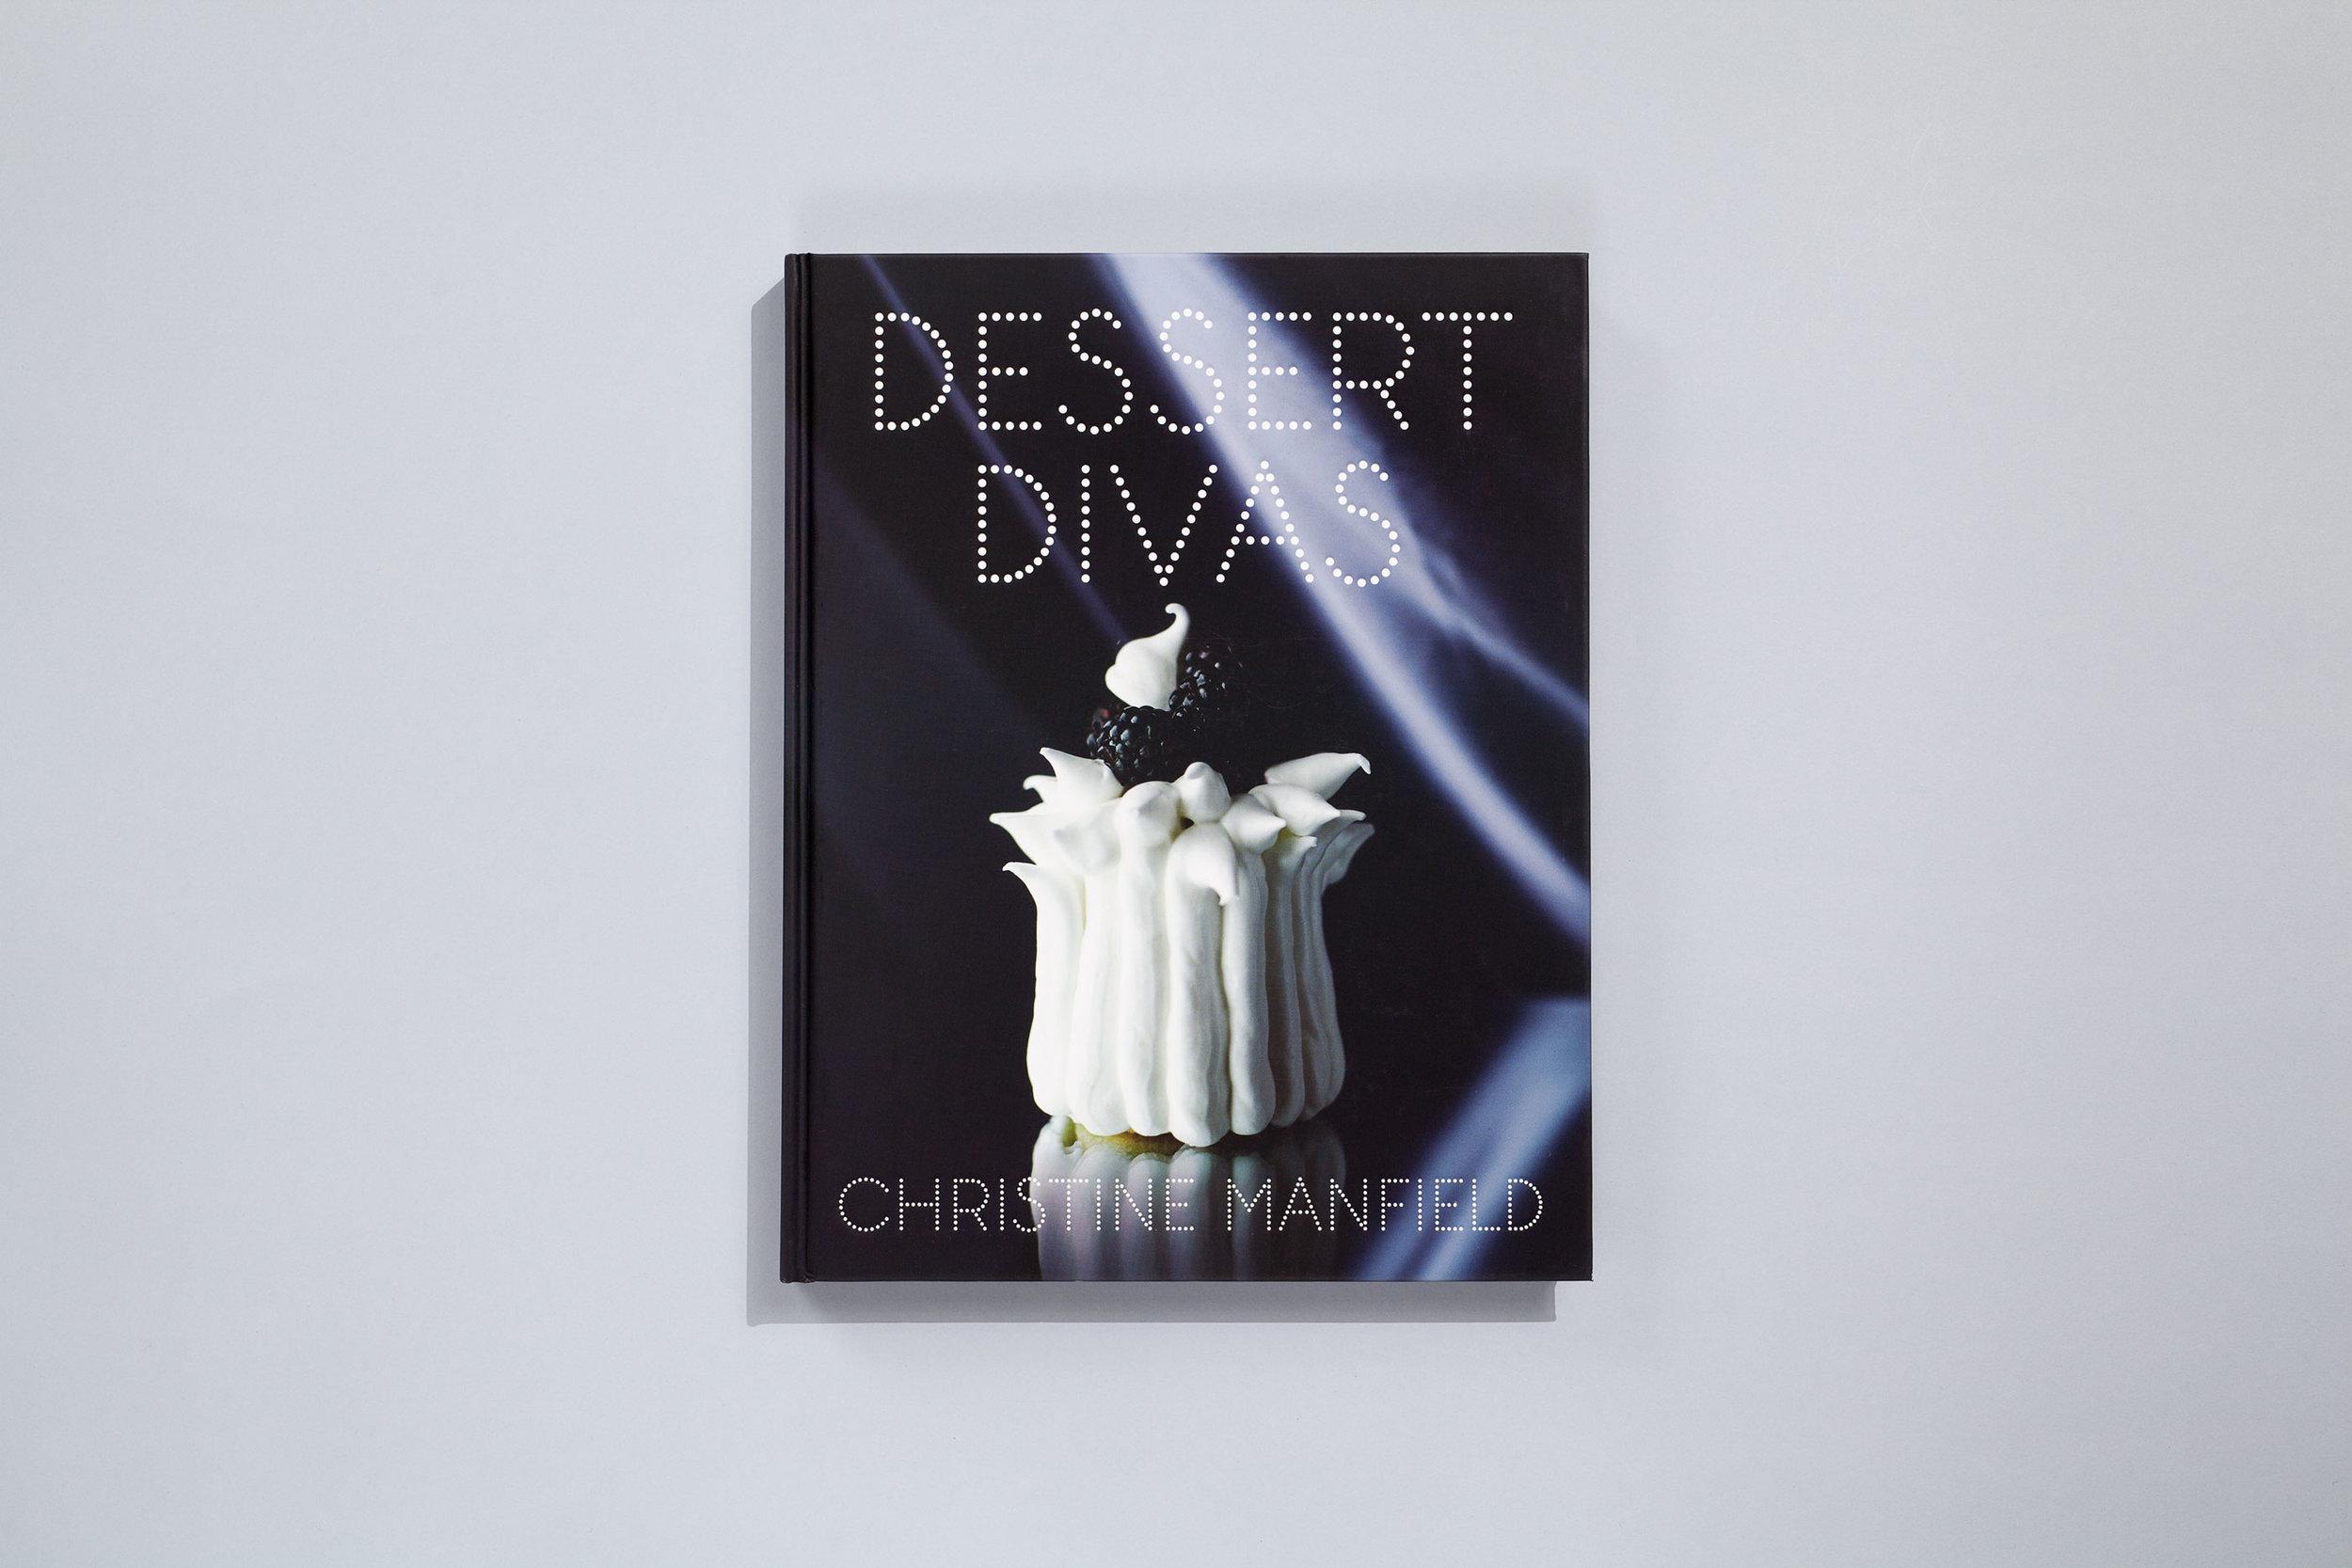 Title – Dessert Divas Author – Christine Manfield Designer – Daniel New Photographer – Anson Smart Stylist – David Morgan Publisher – Lantern, Penguin Books